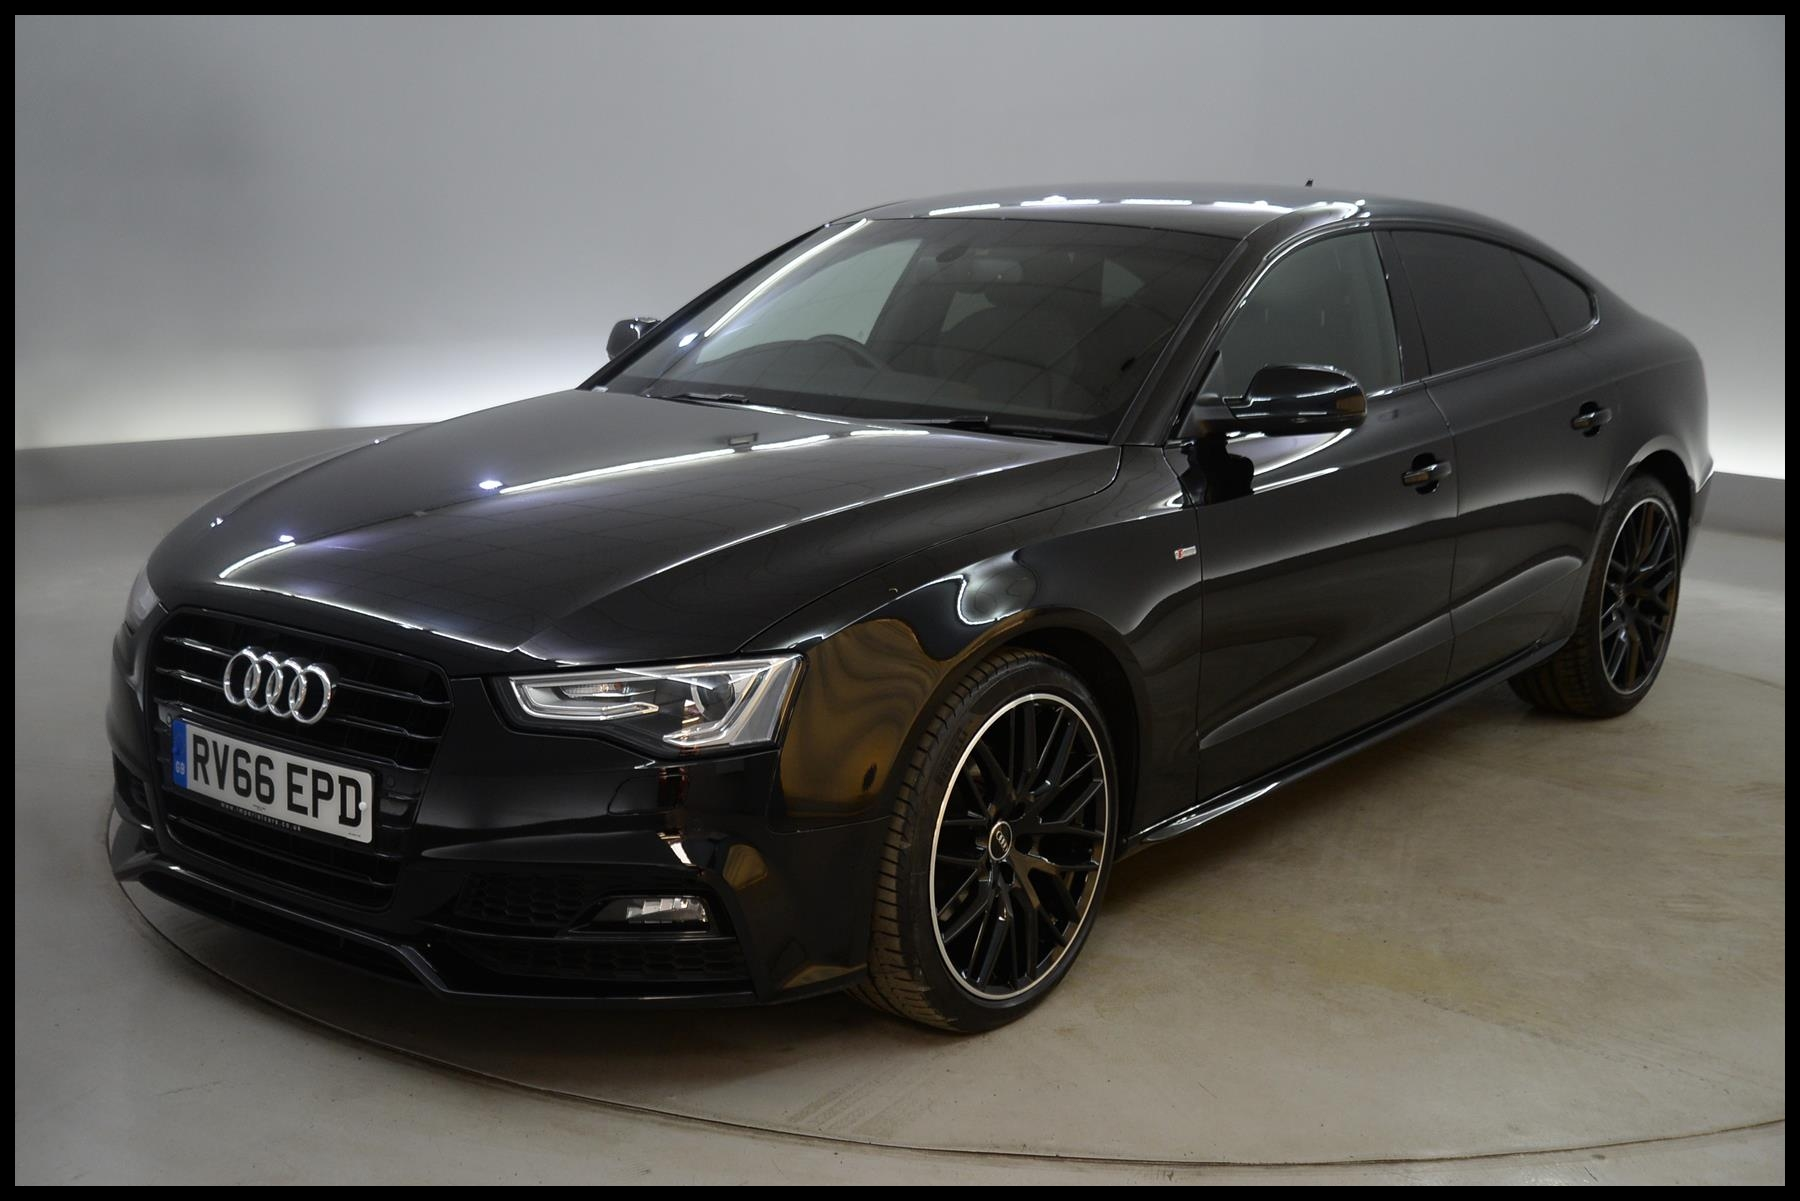 Audi A5 2 0 TDI 190 Black Ed Plus 5dr Multitronic [5st] NAV BANG & OLUFSEN NA 2016